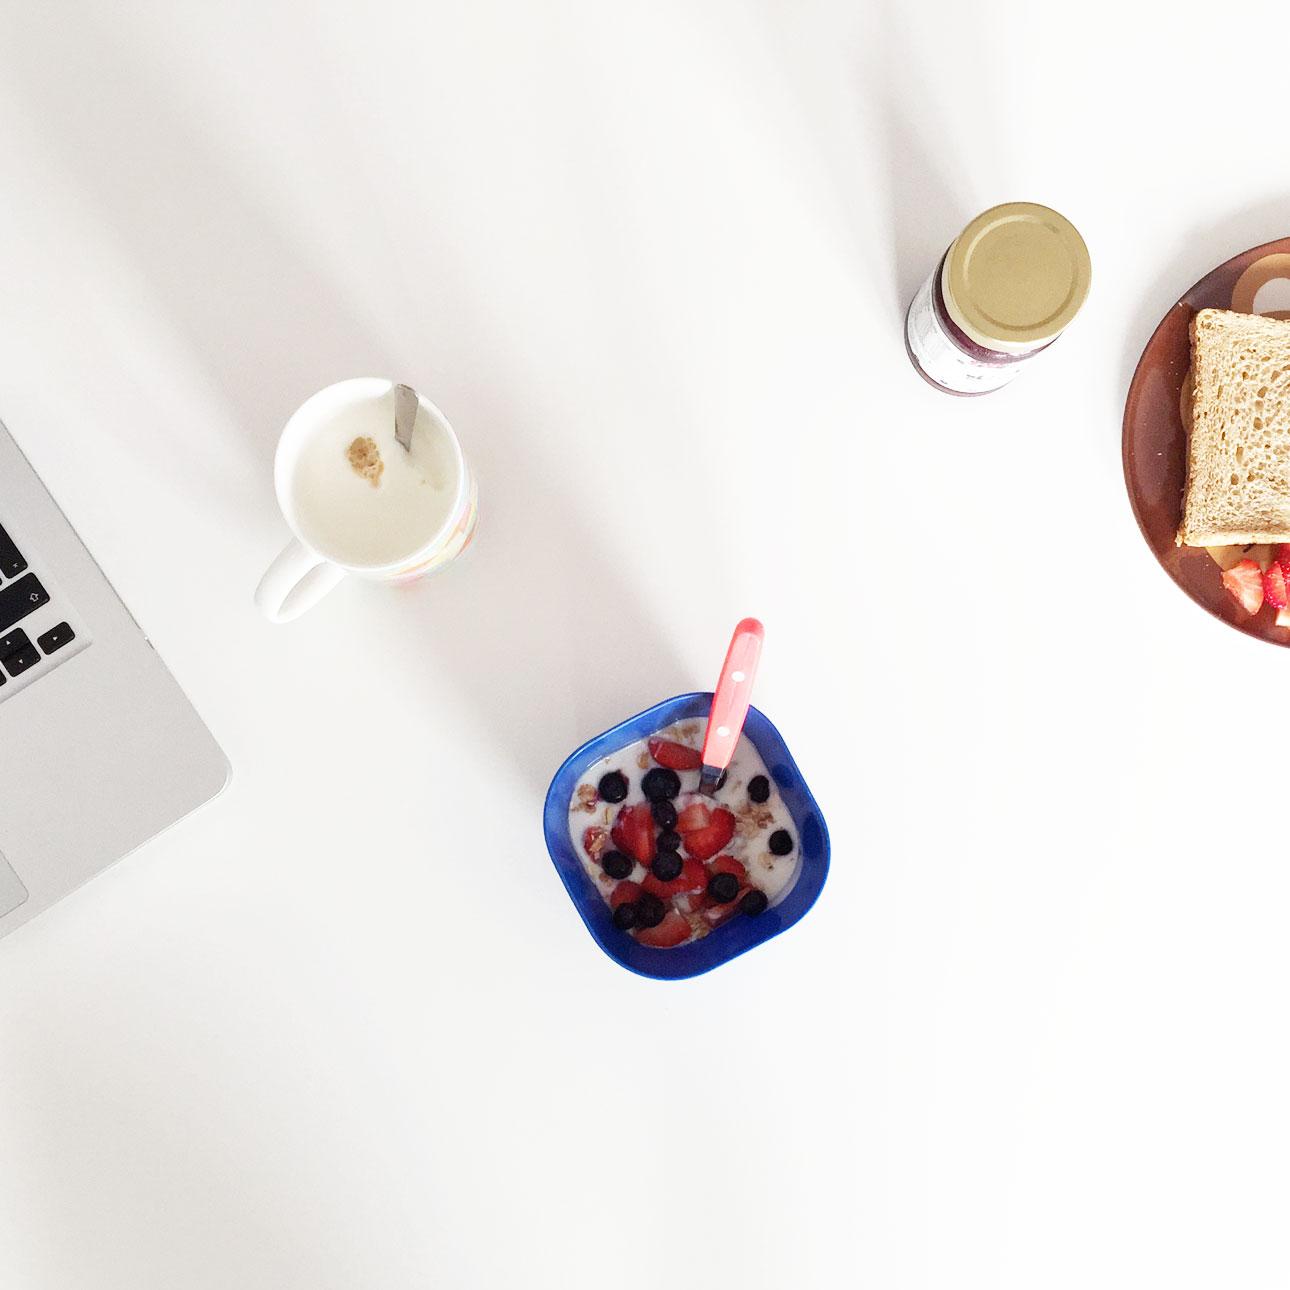 Mamalifestyle september 2015 1 ontbijt met Jaaf